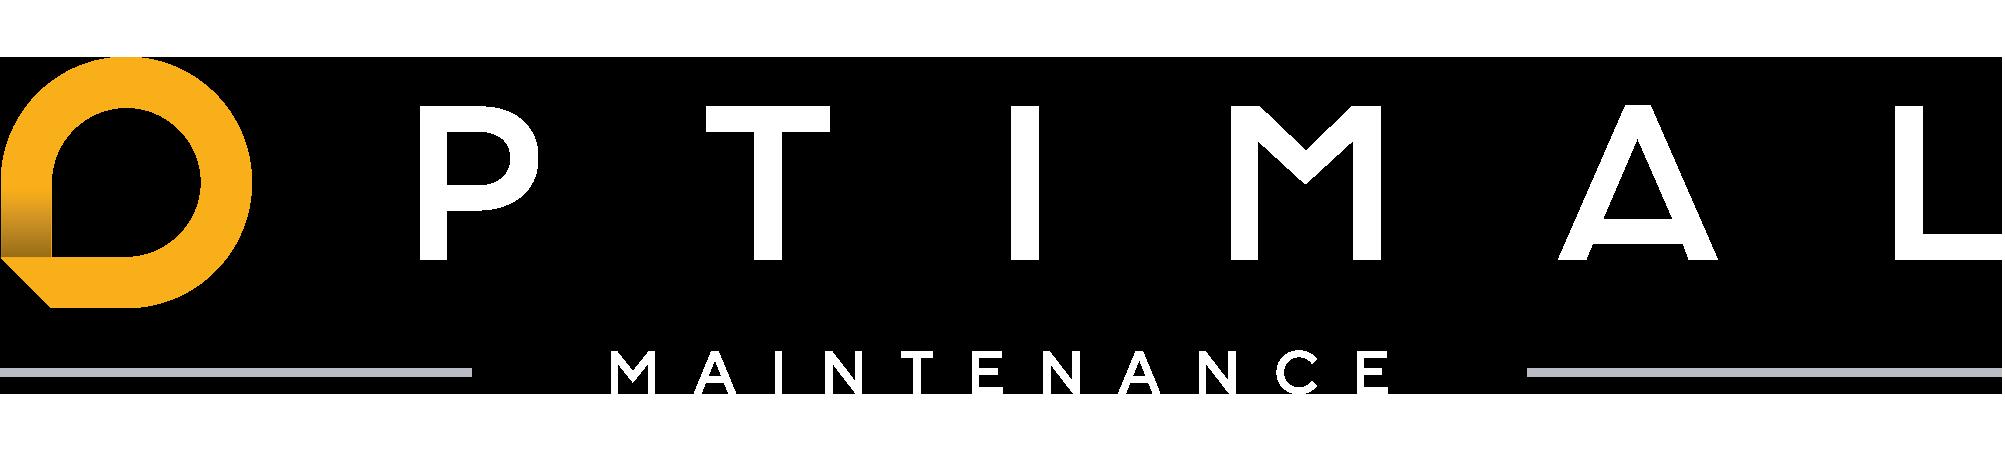 Optimal Property Maintenance